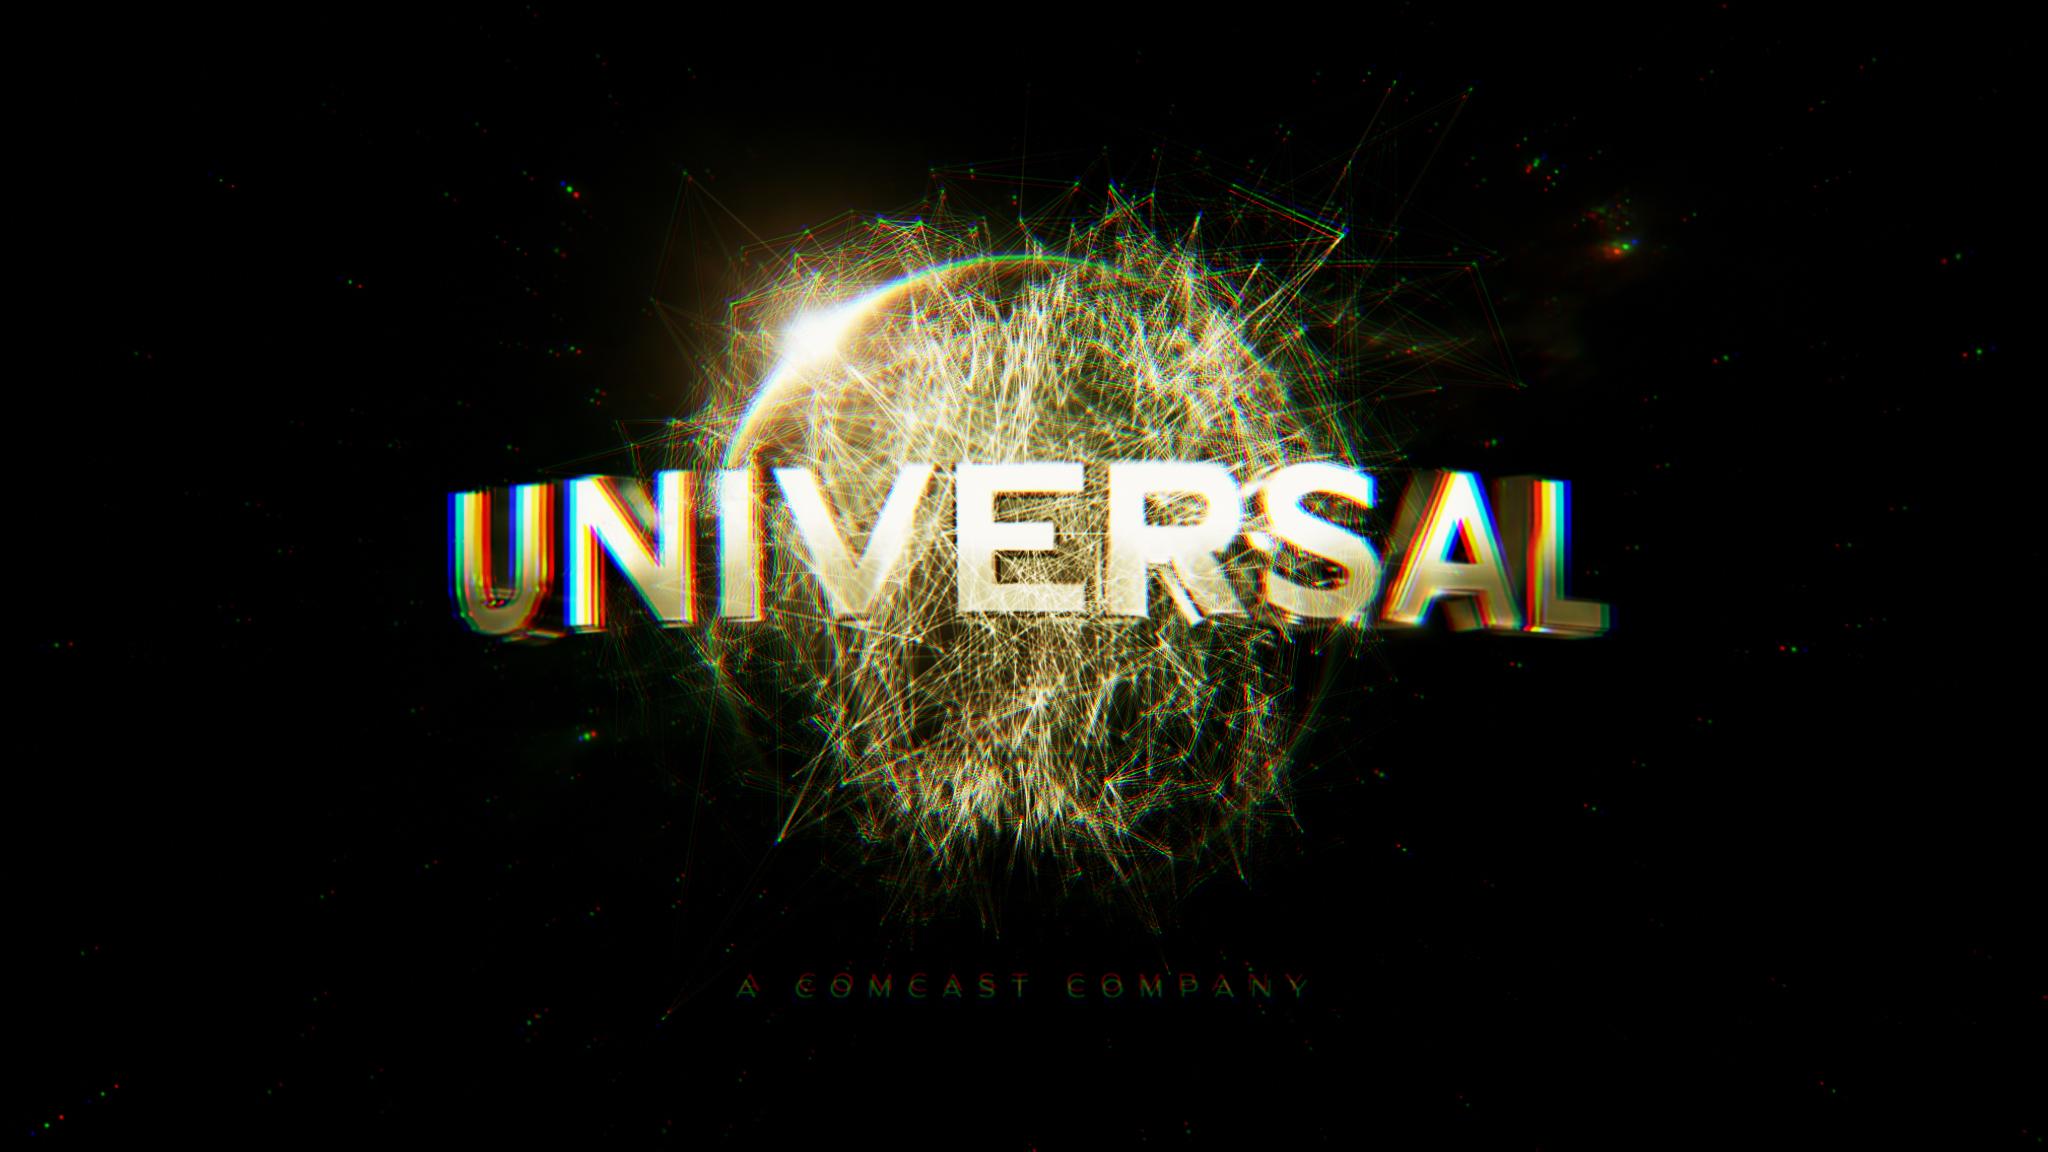 DARK_UNI_01_UNIVERSAL_v06b_AK_HD copy.jpg